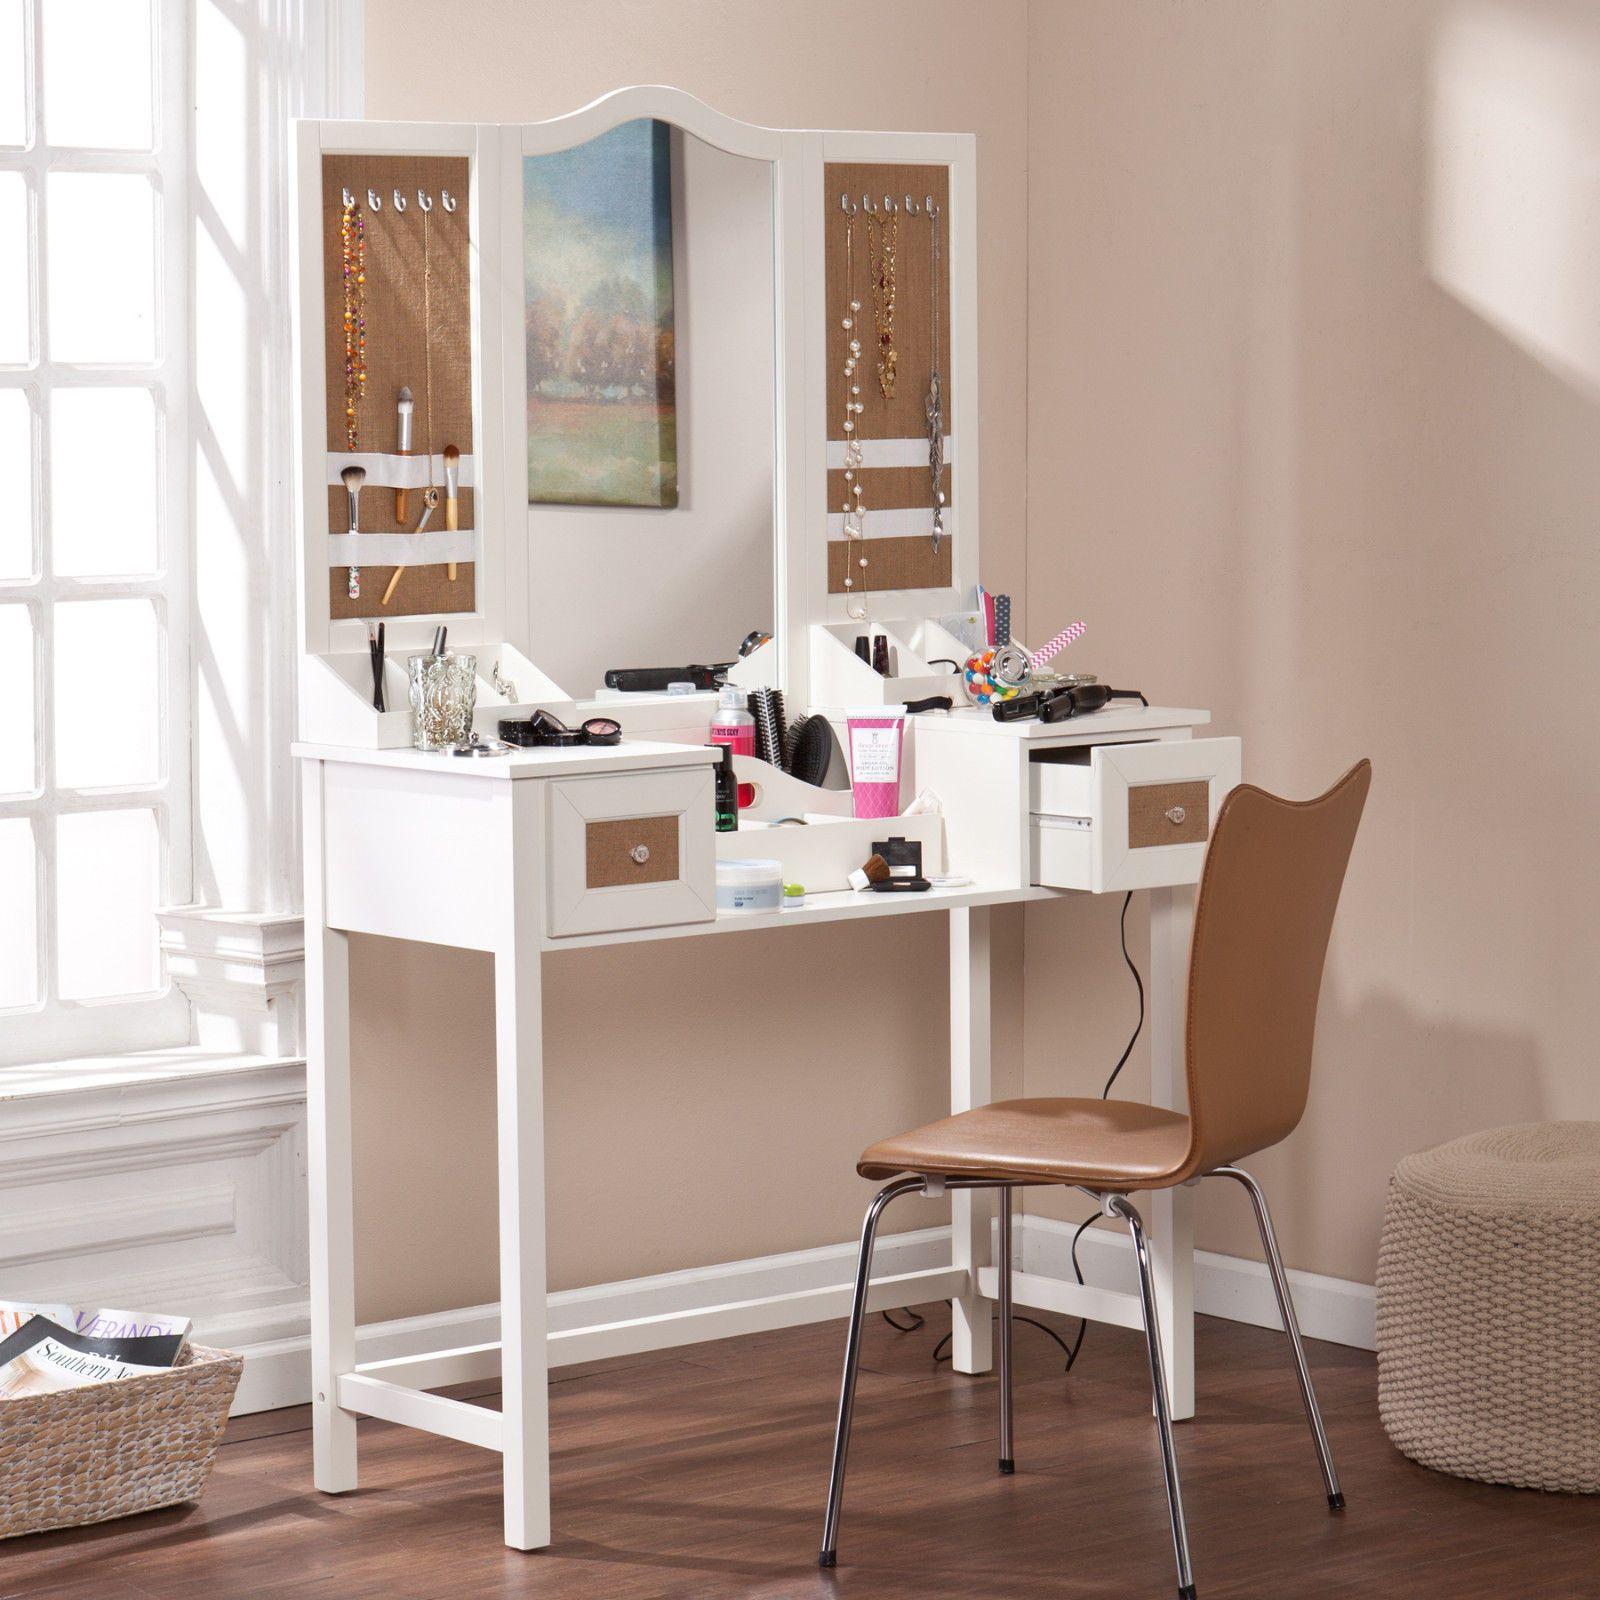 56 Best Bedroom Vanity Images On Pinterest | Bedroom Vanities, Vanity Tables  And Bedroom Vanity Set